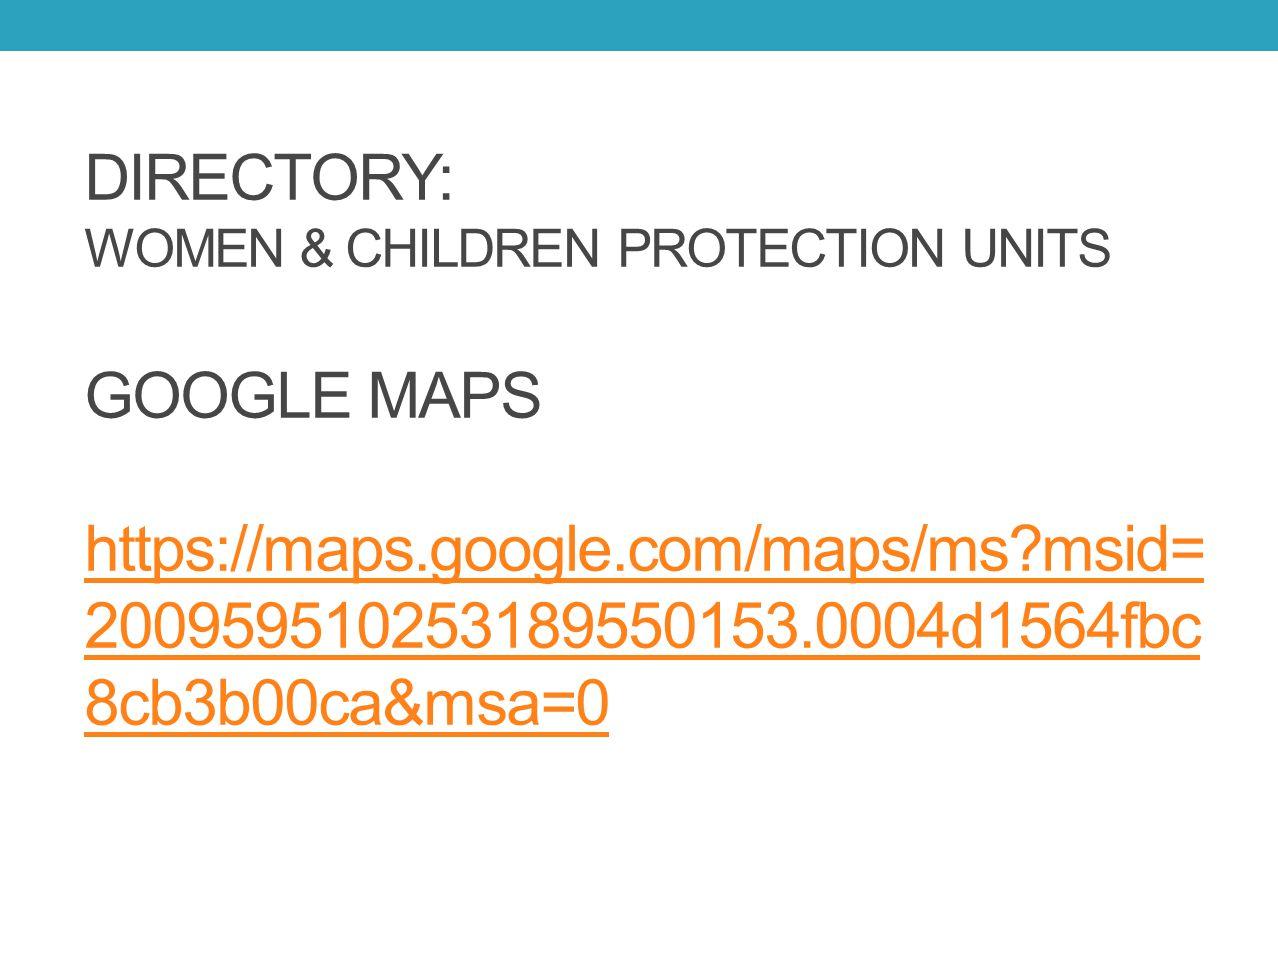 DIRECTORY: WOMEN & CHILDREN PROTECTION UNITS GOOGLE MAPS https://maps.google.com/maps/ms?msid= 200959510253189550153.0004d1564fbc 8cb3b00ca&msa=0 http